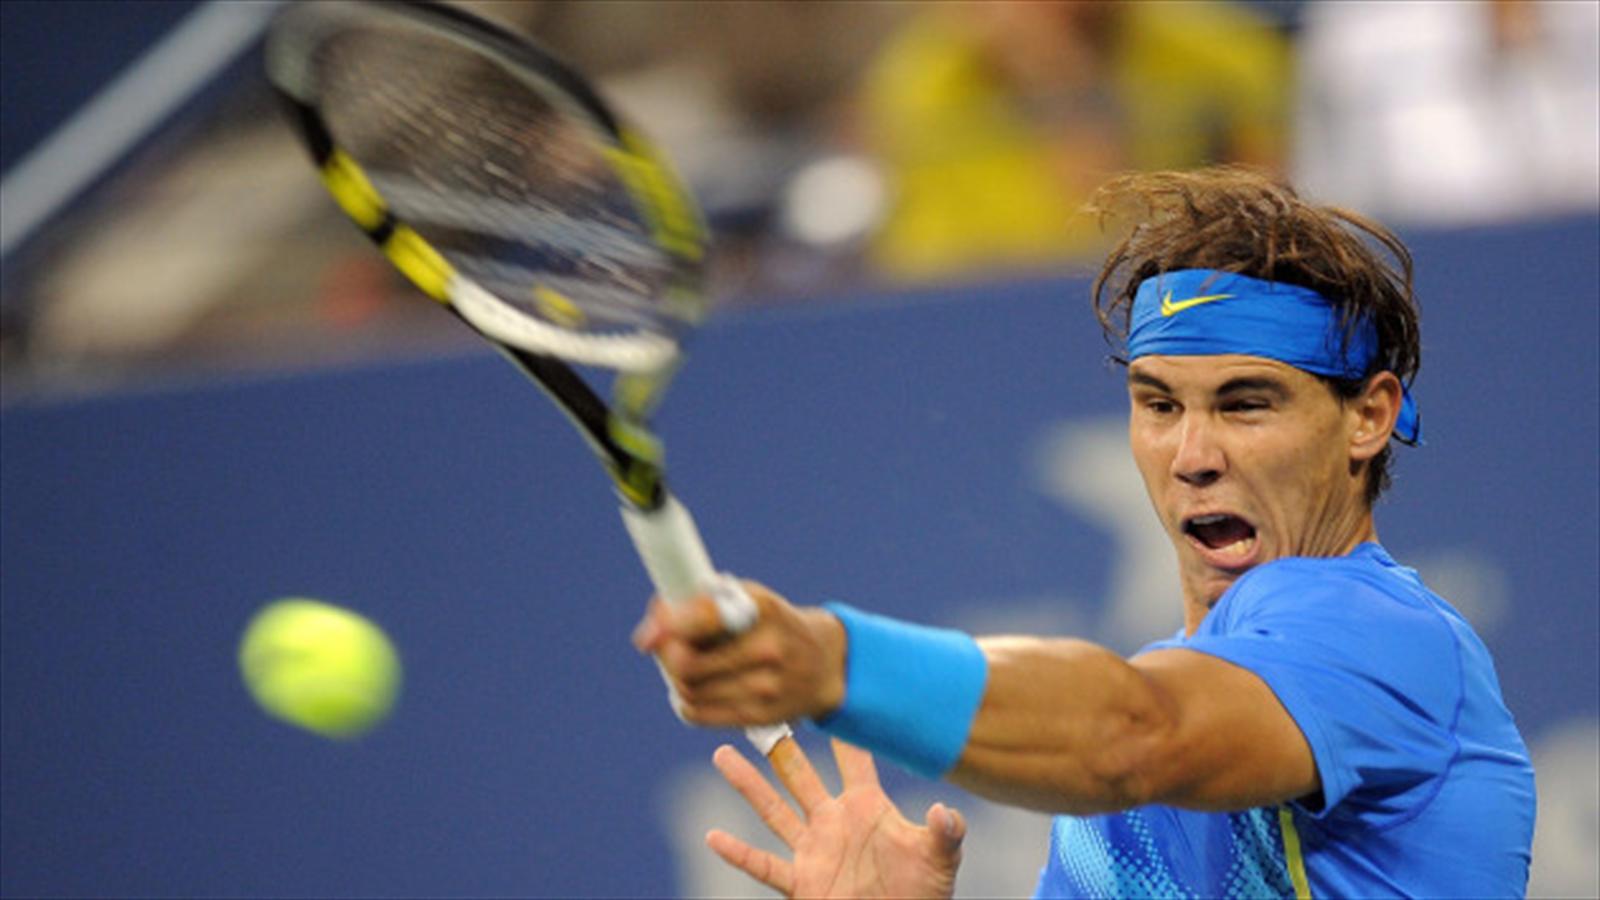 LIVE Rafael Nadal David Goffin ATP World Tour Finals 13